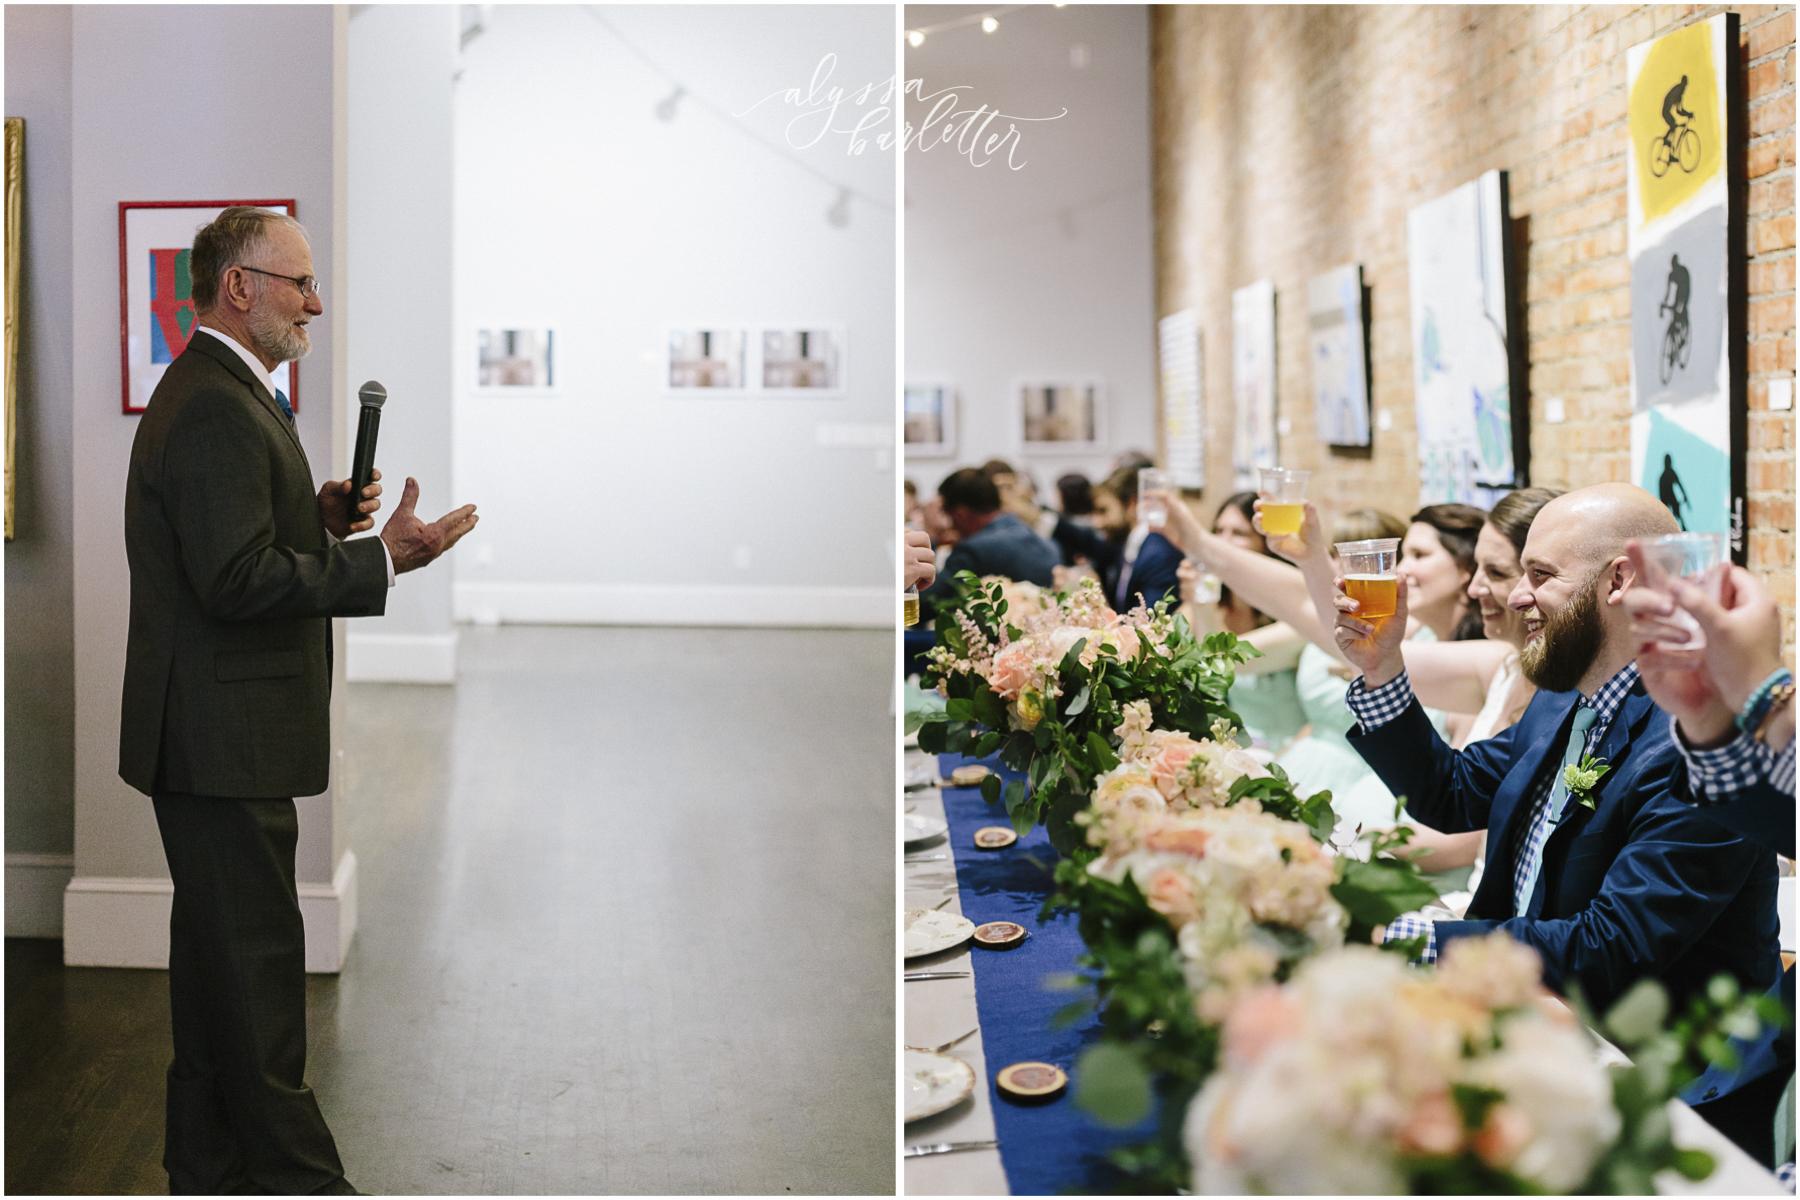 alyssa barletter photography kansas city wedding 2016 main courtney and brian-1-46.jpg